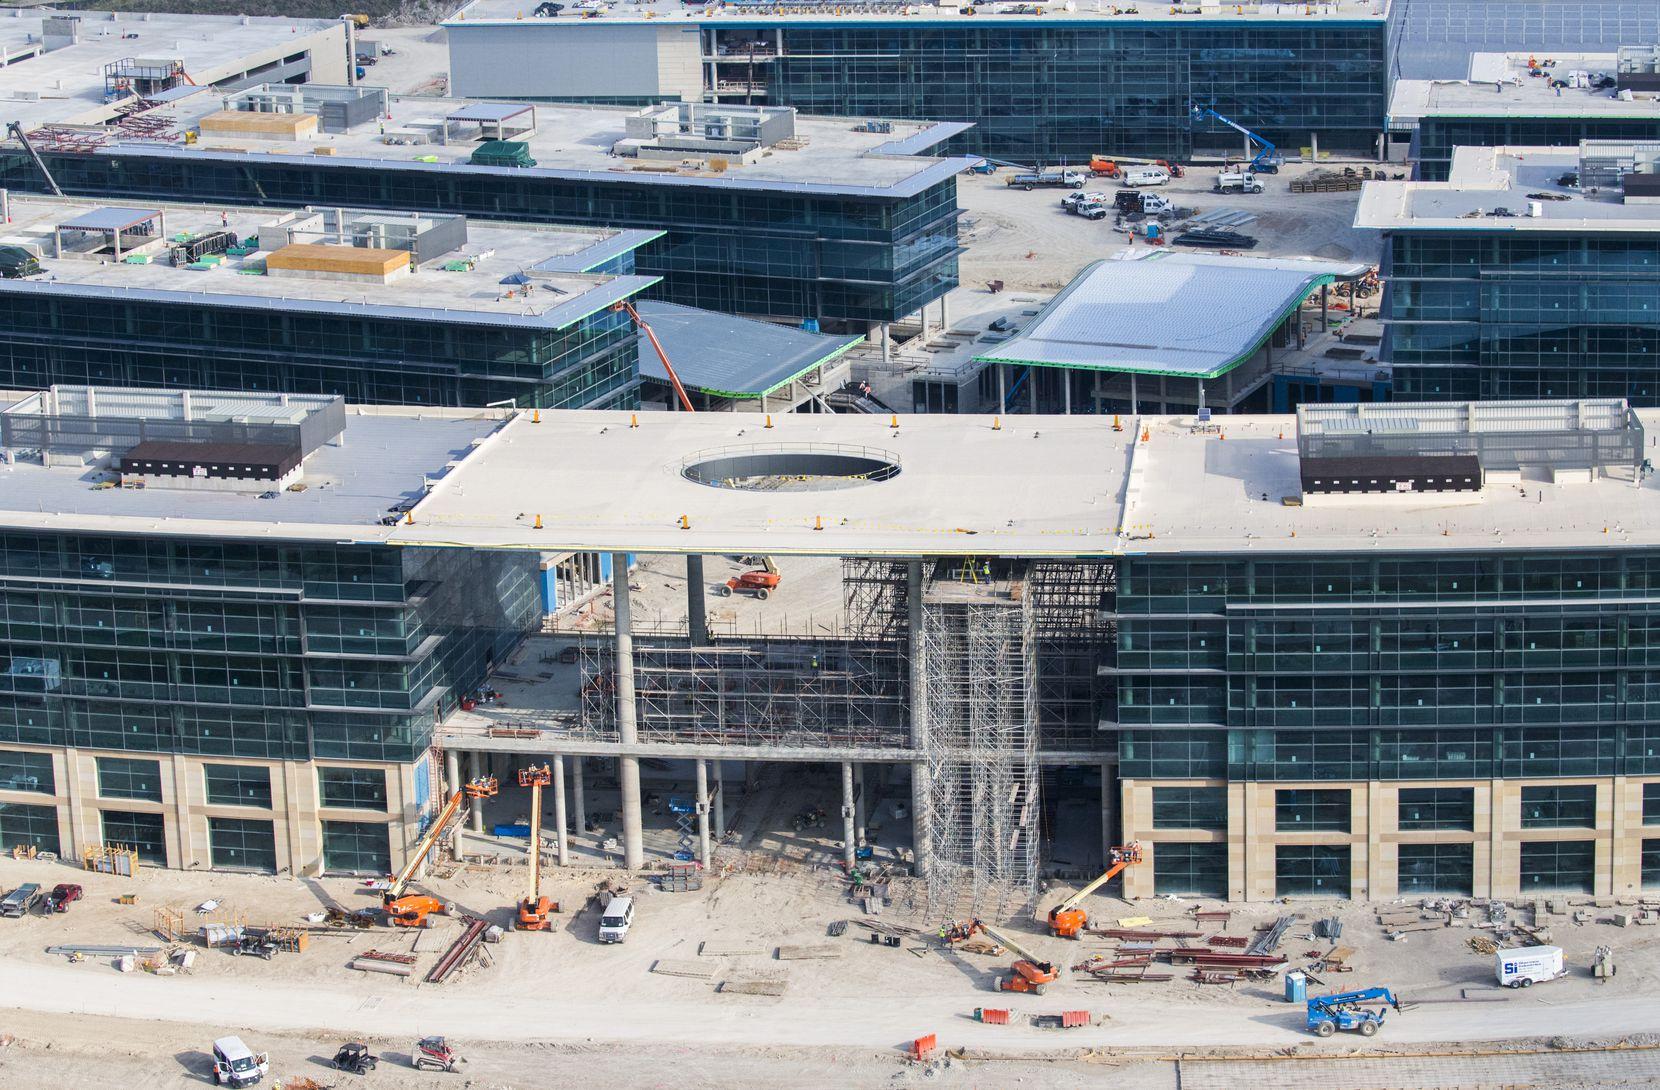 Toyota's new U.S. headquarters under construction in Plano. (Ashley Landis/The Dallas Morning News)